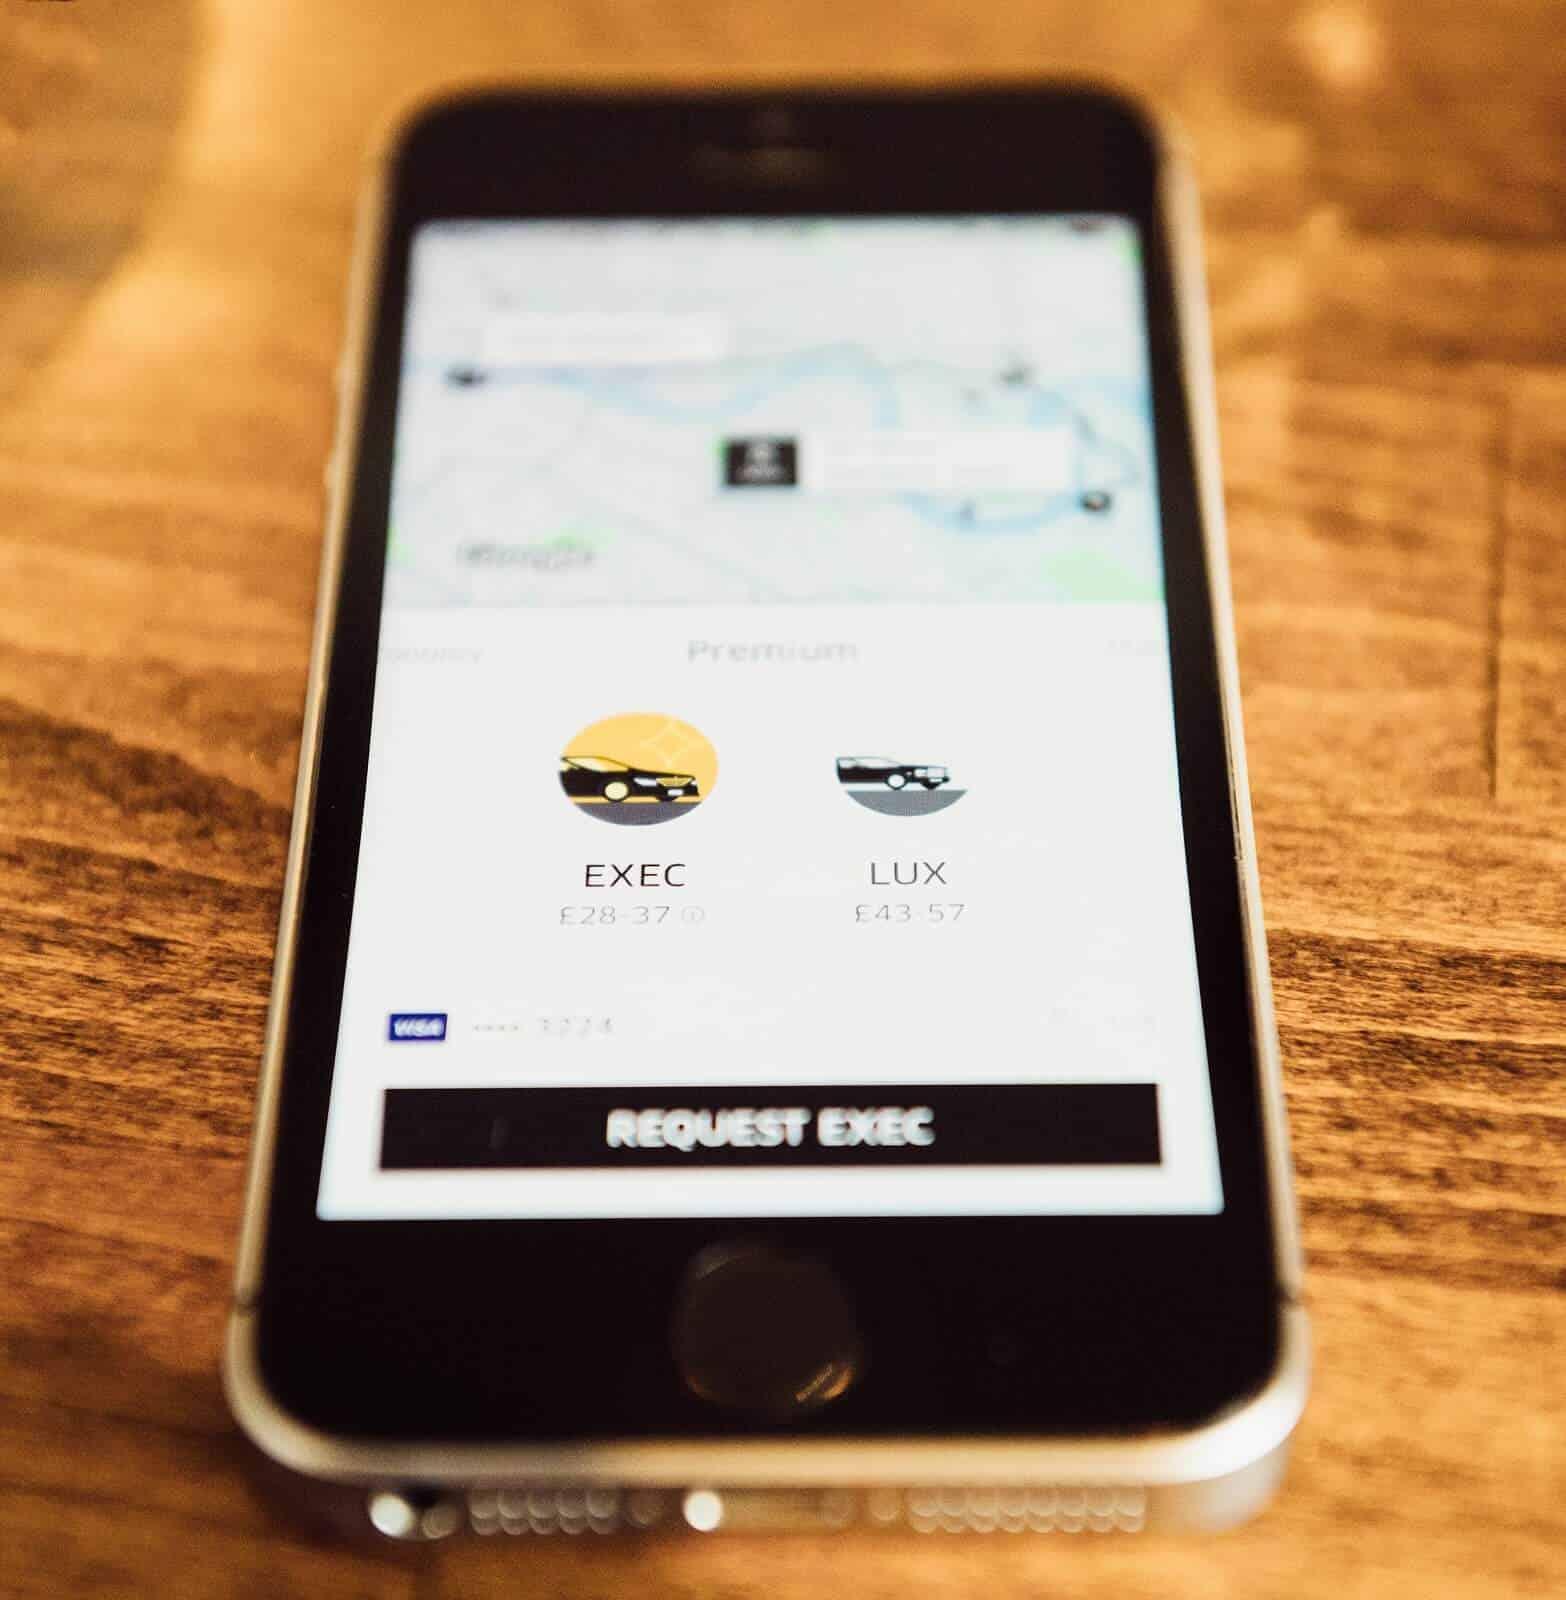 Using Uber on smartphone